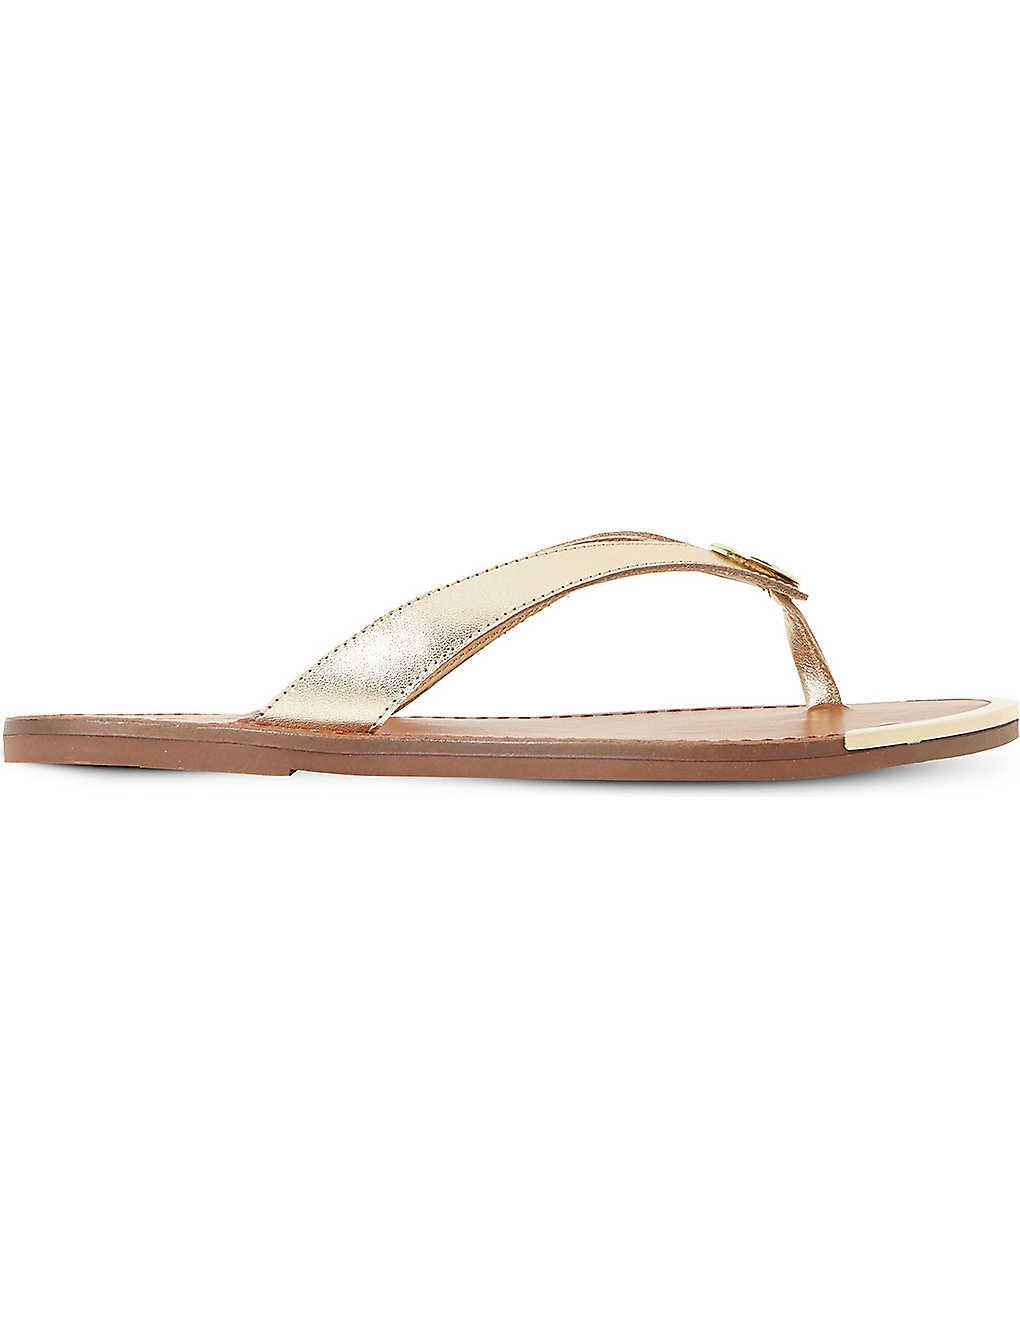 a7775f3e7ede DUNE - Lagos metallic leather sandals